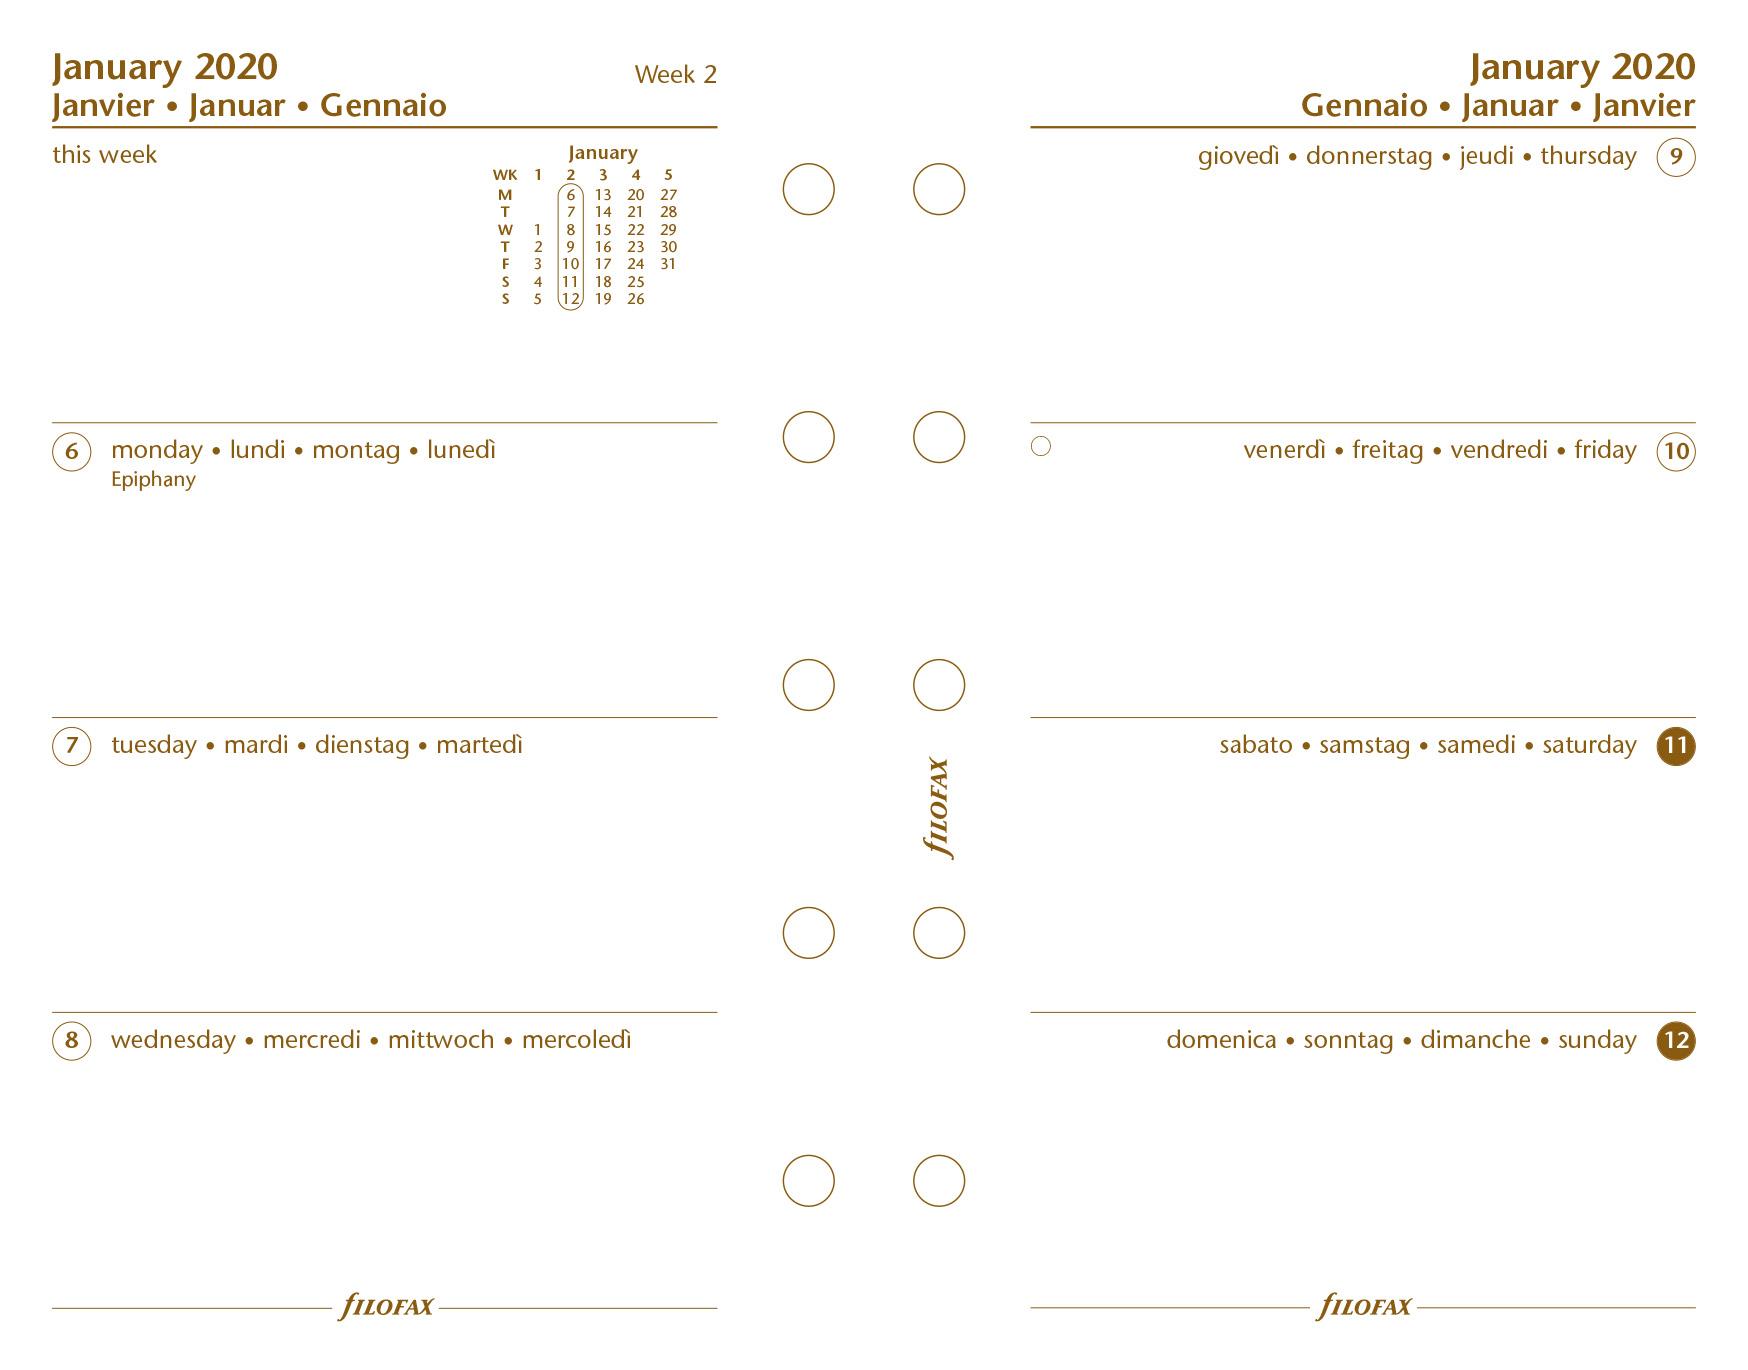 Filofax Mini Woche Zwei Seiten 4 Language Baumwolle Creme 2020 Tagebuch